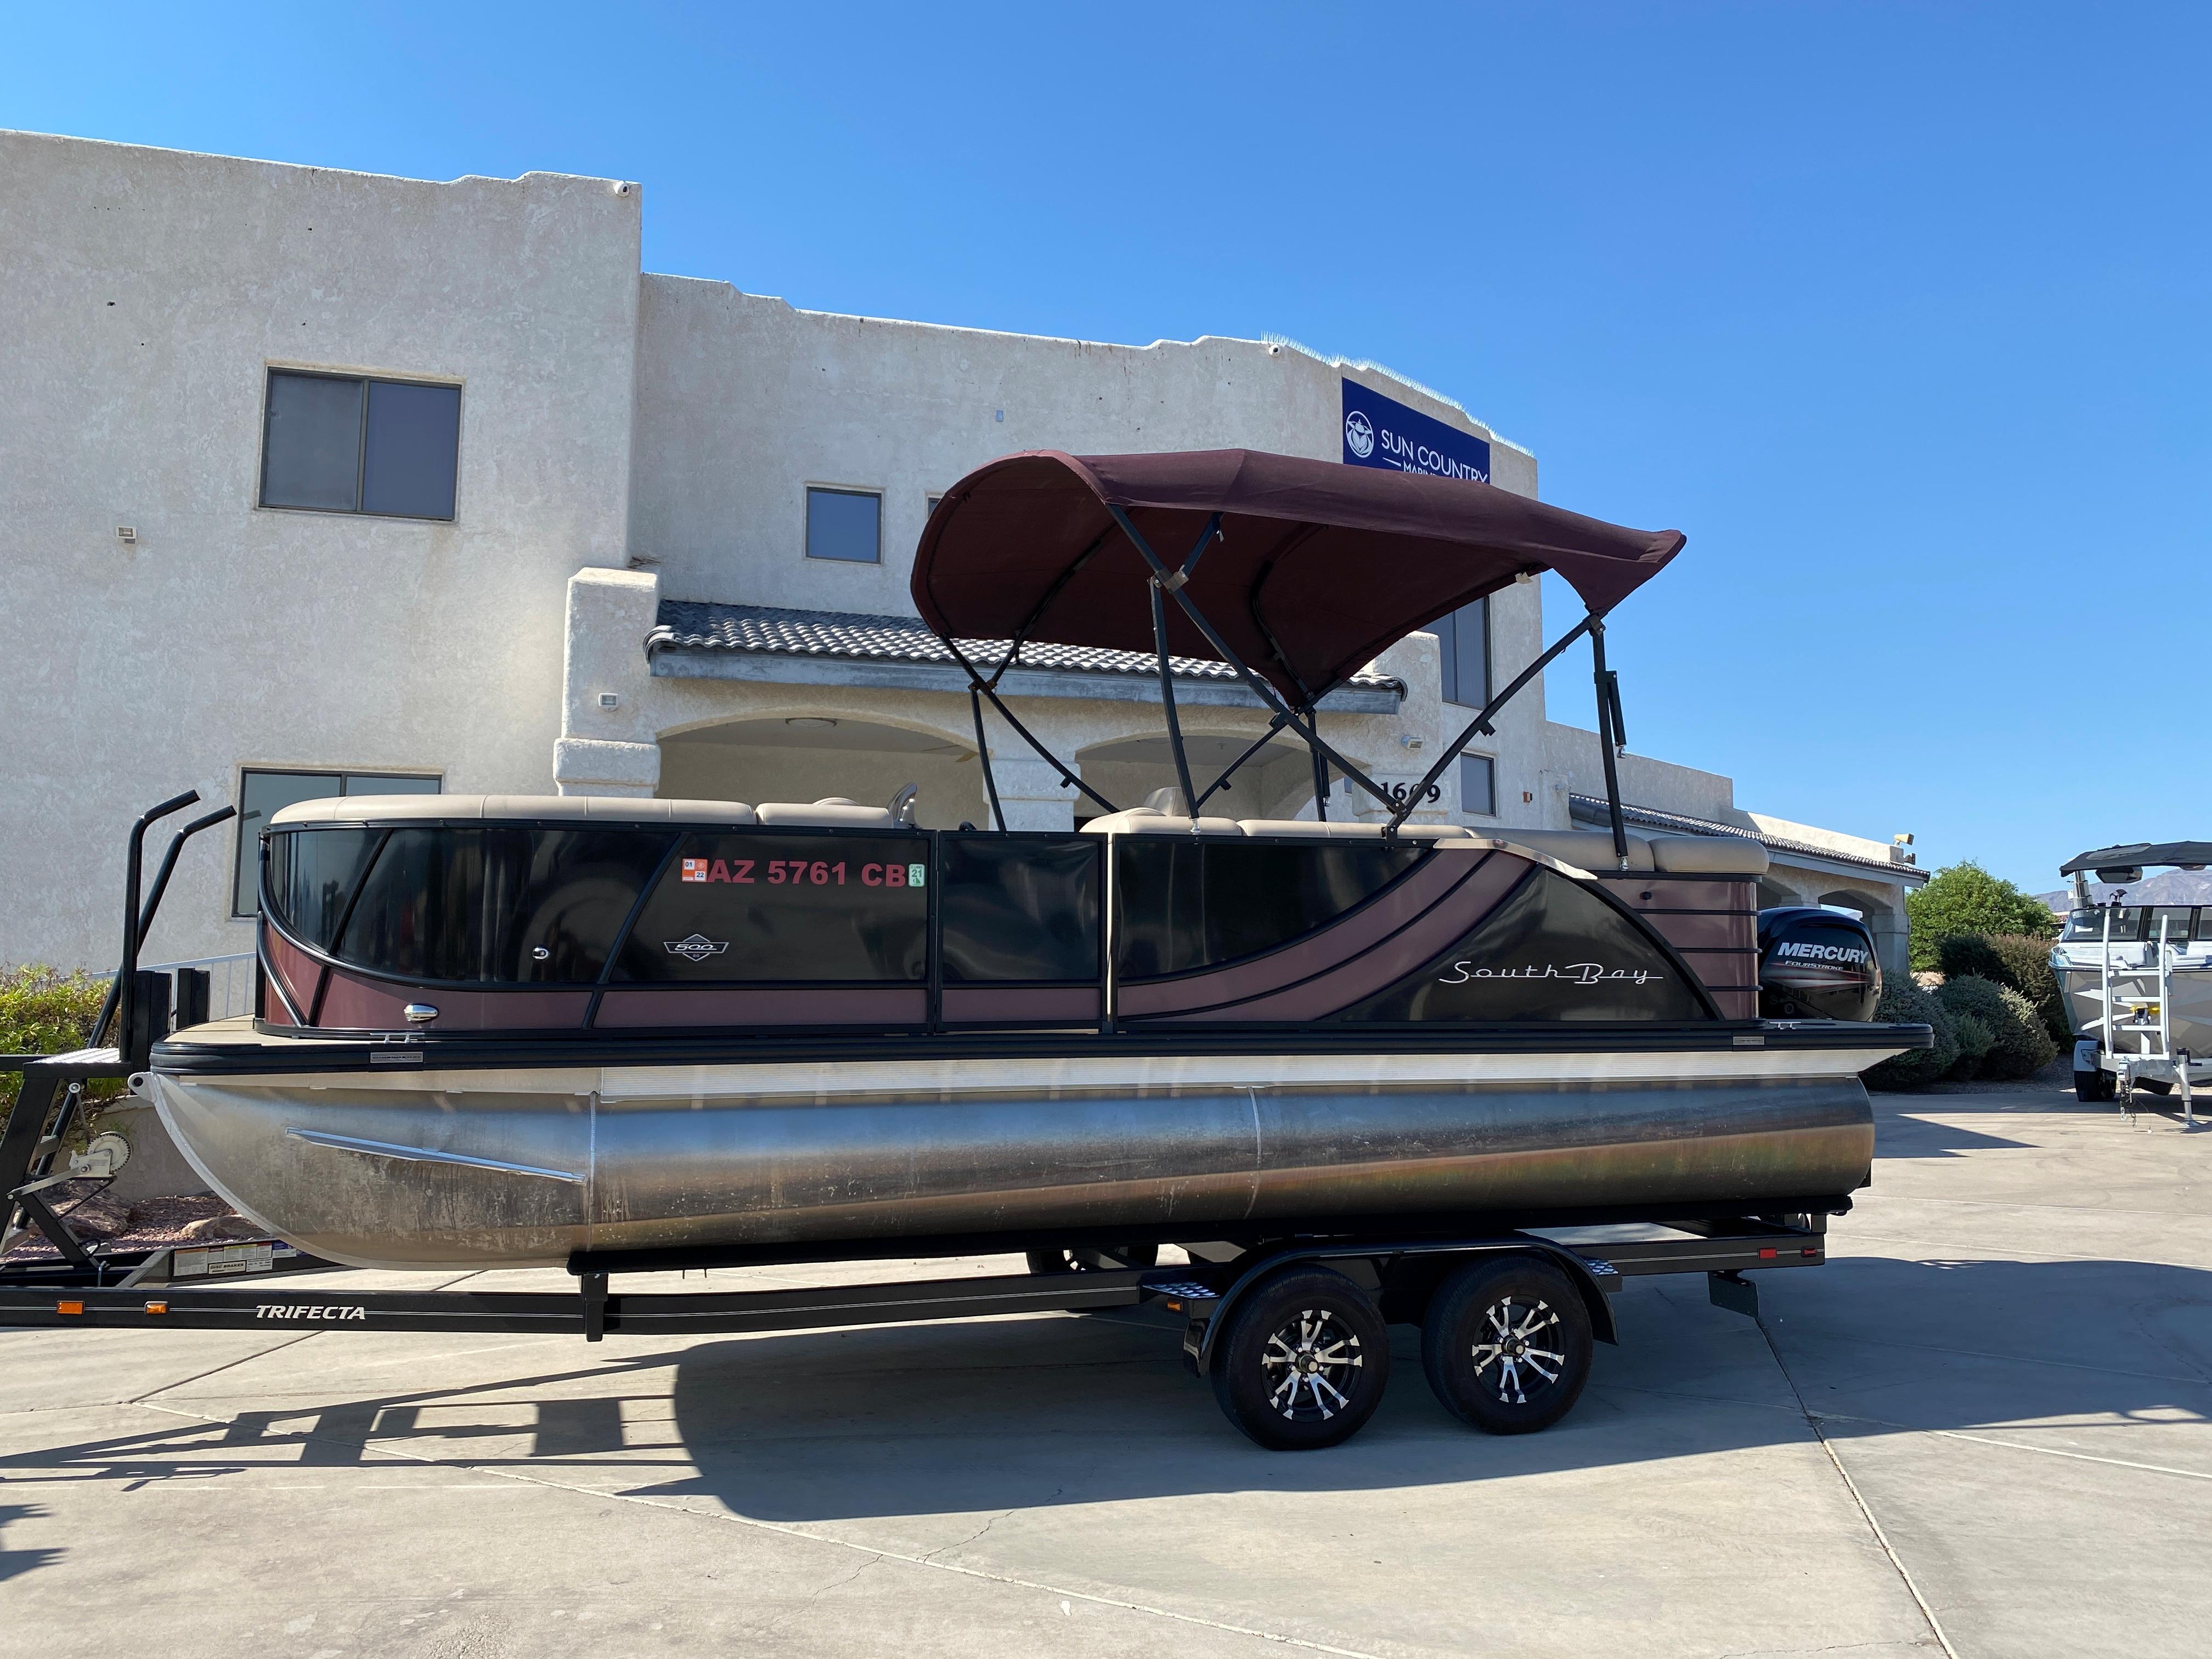 2019 South Bay 521CR #TB1982JC inventory image at Sun Country Inland in Lake Havasu City